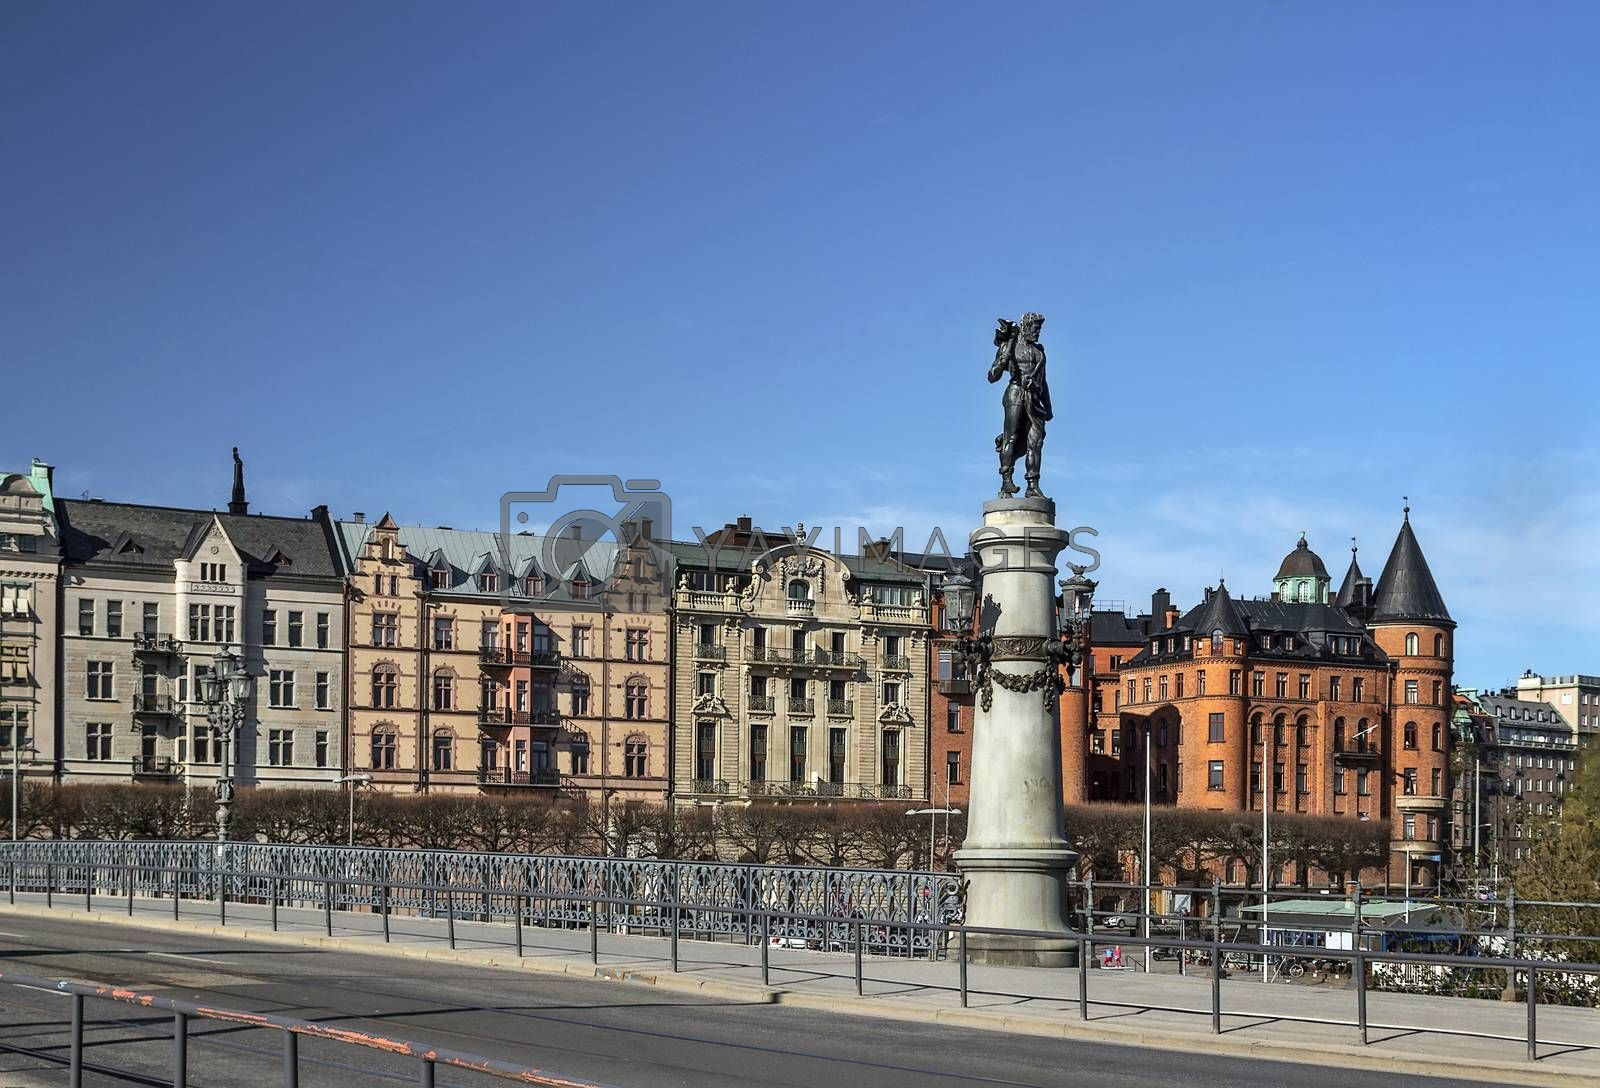 Strandvagen, Stockholm by borisb17